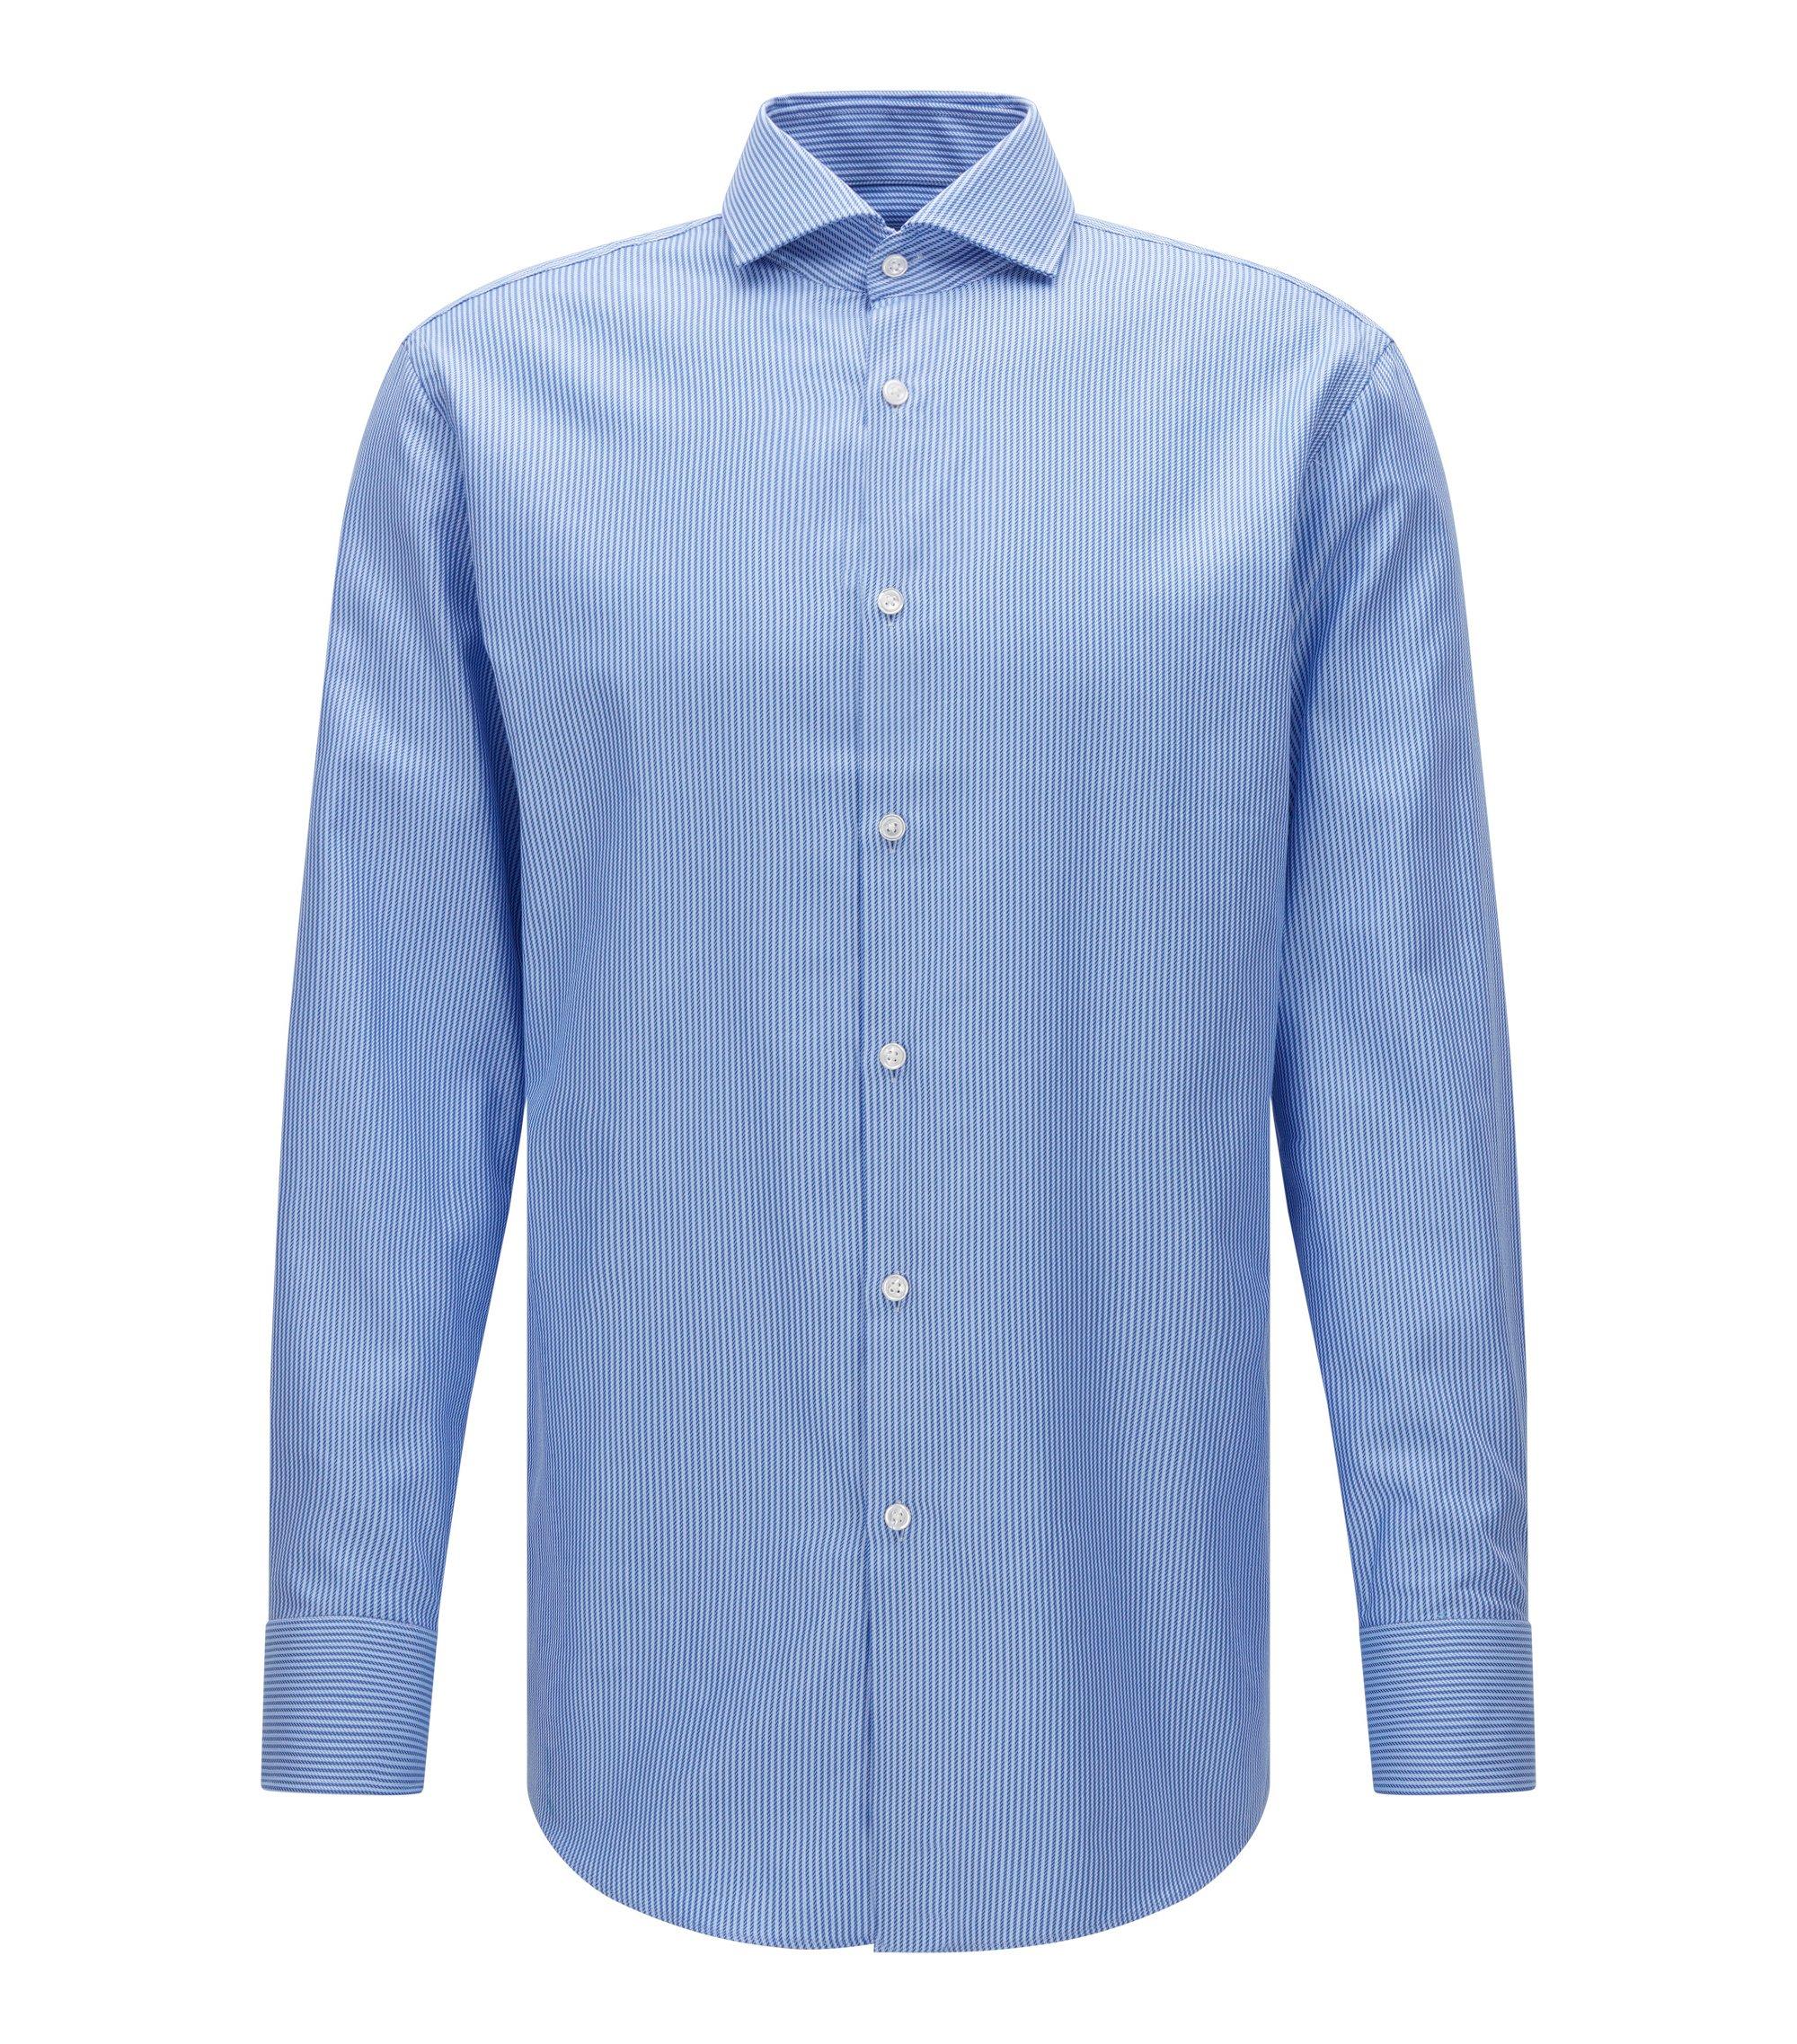 Striped Cotton Dress Shirt, Sharp Fit | Mark US, Blue